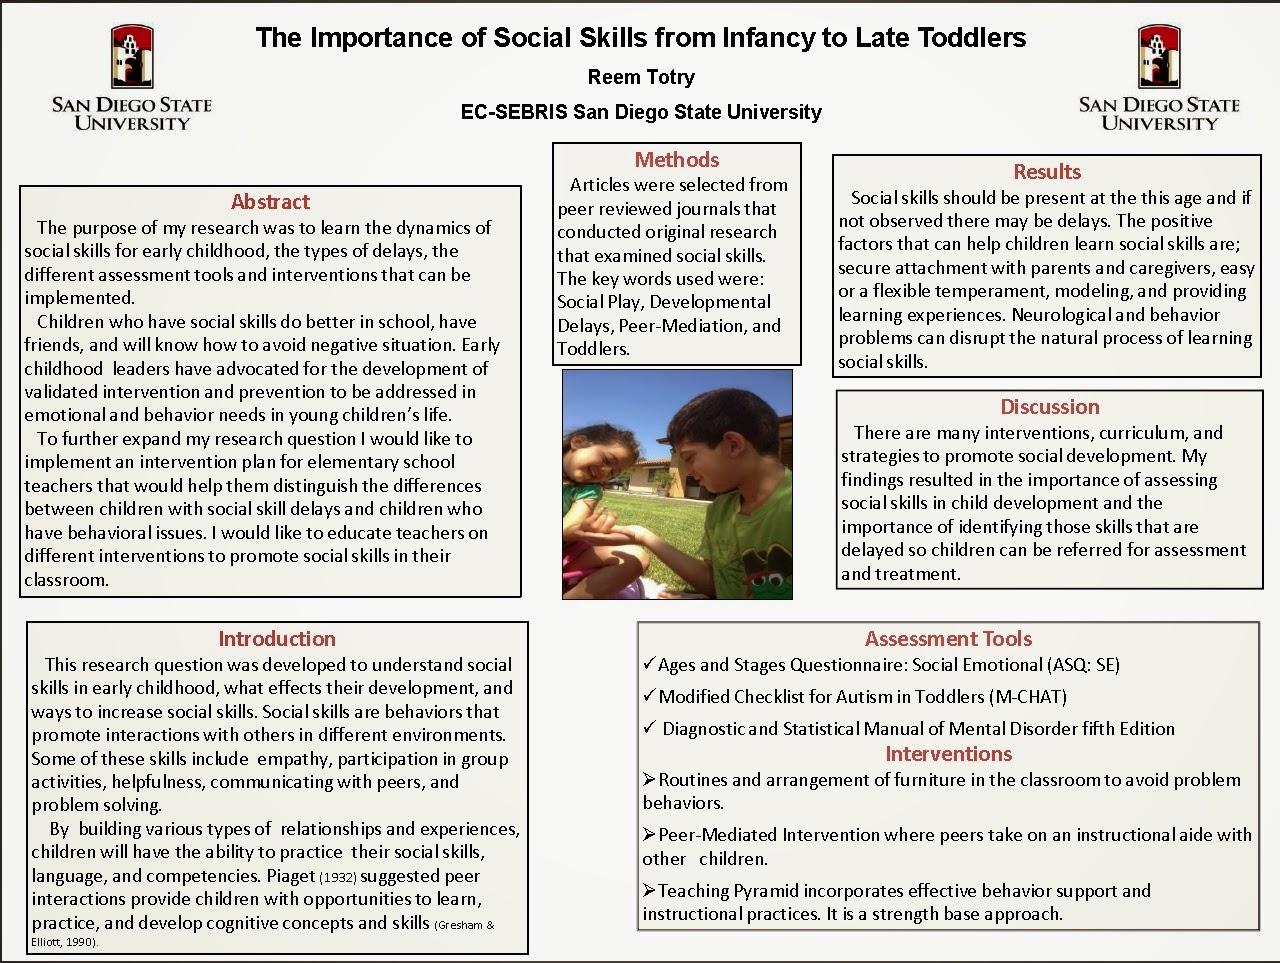 Early Childhood at SDSU: Student Posters- Social Skills